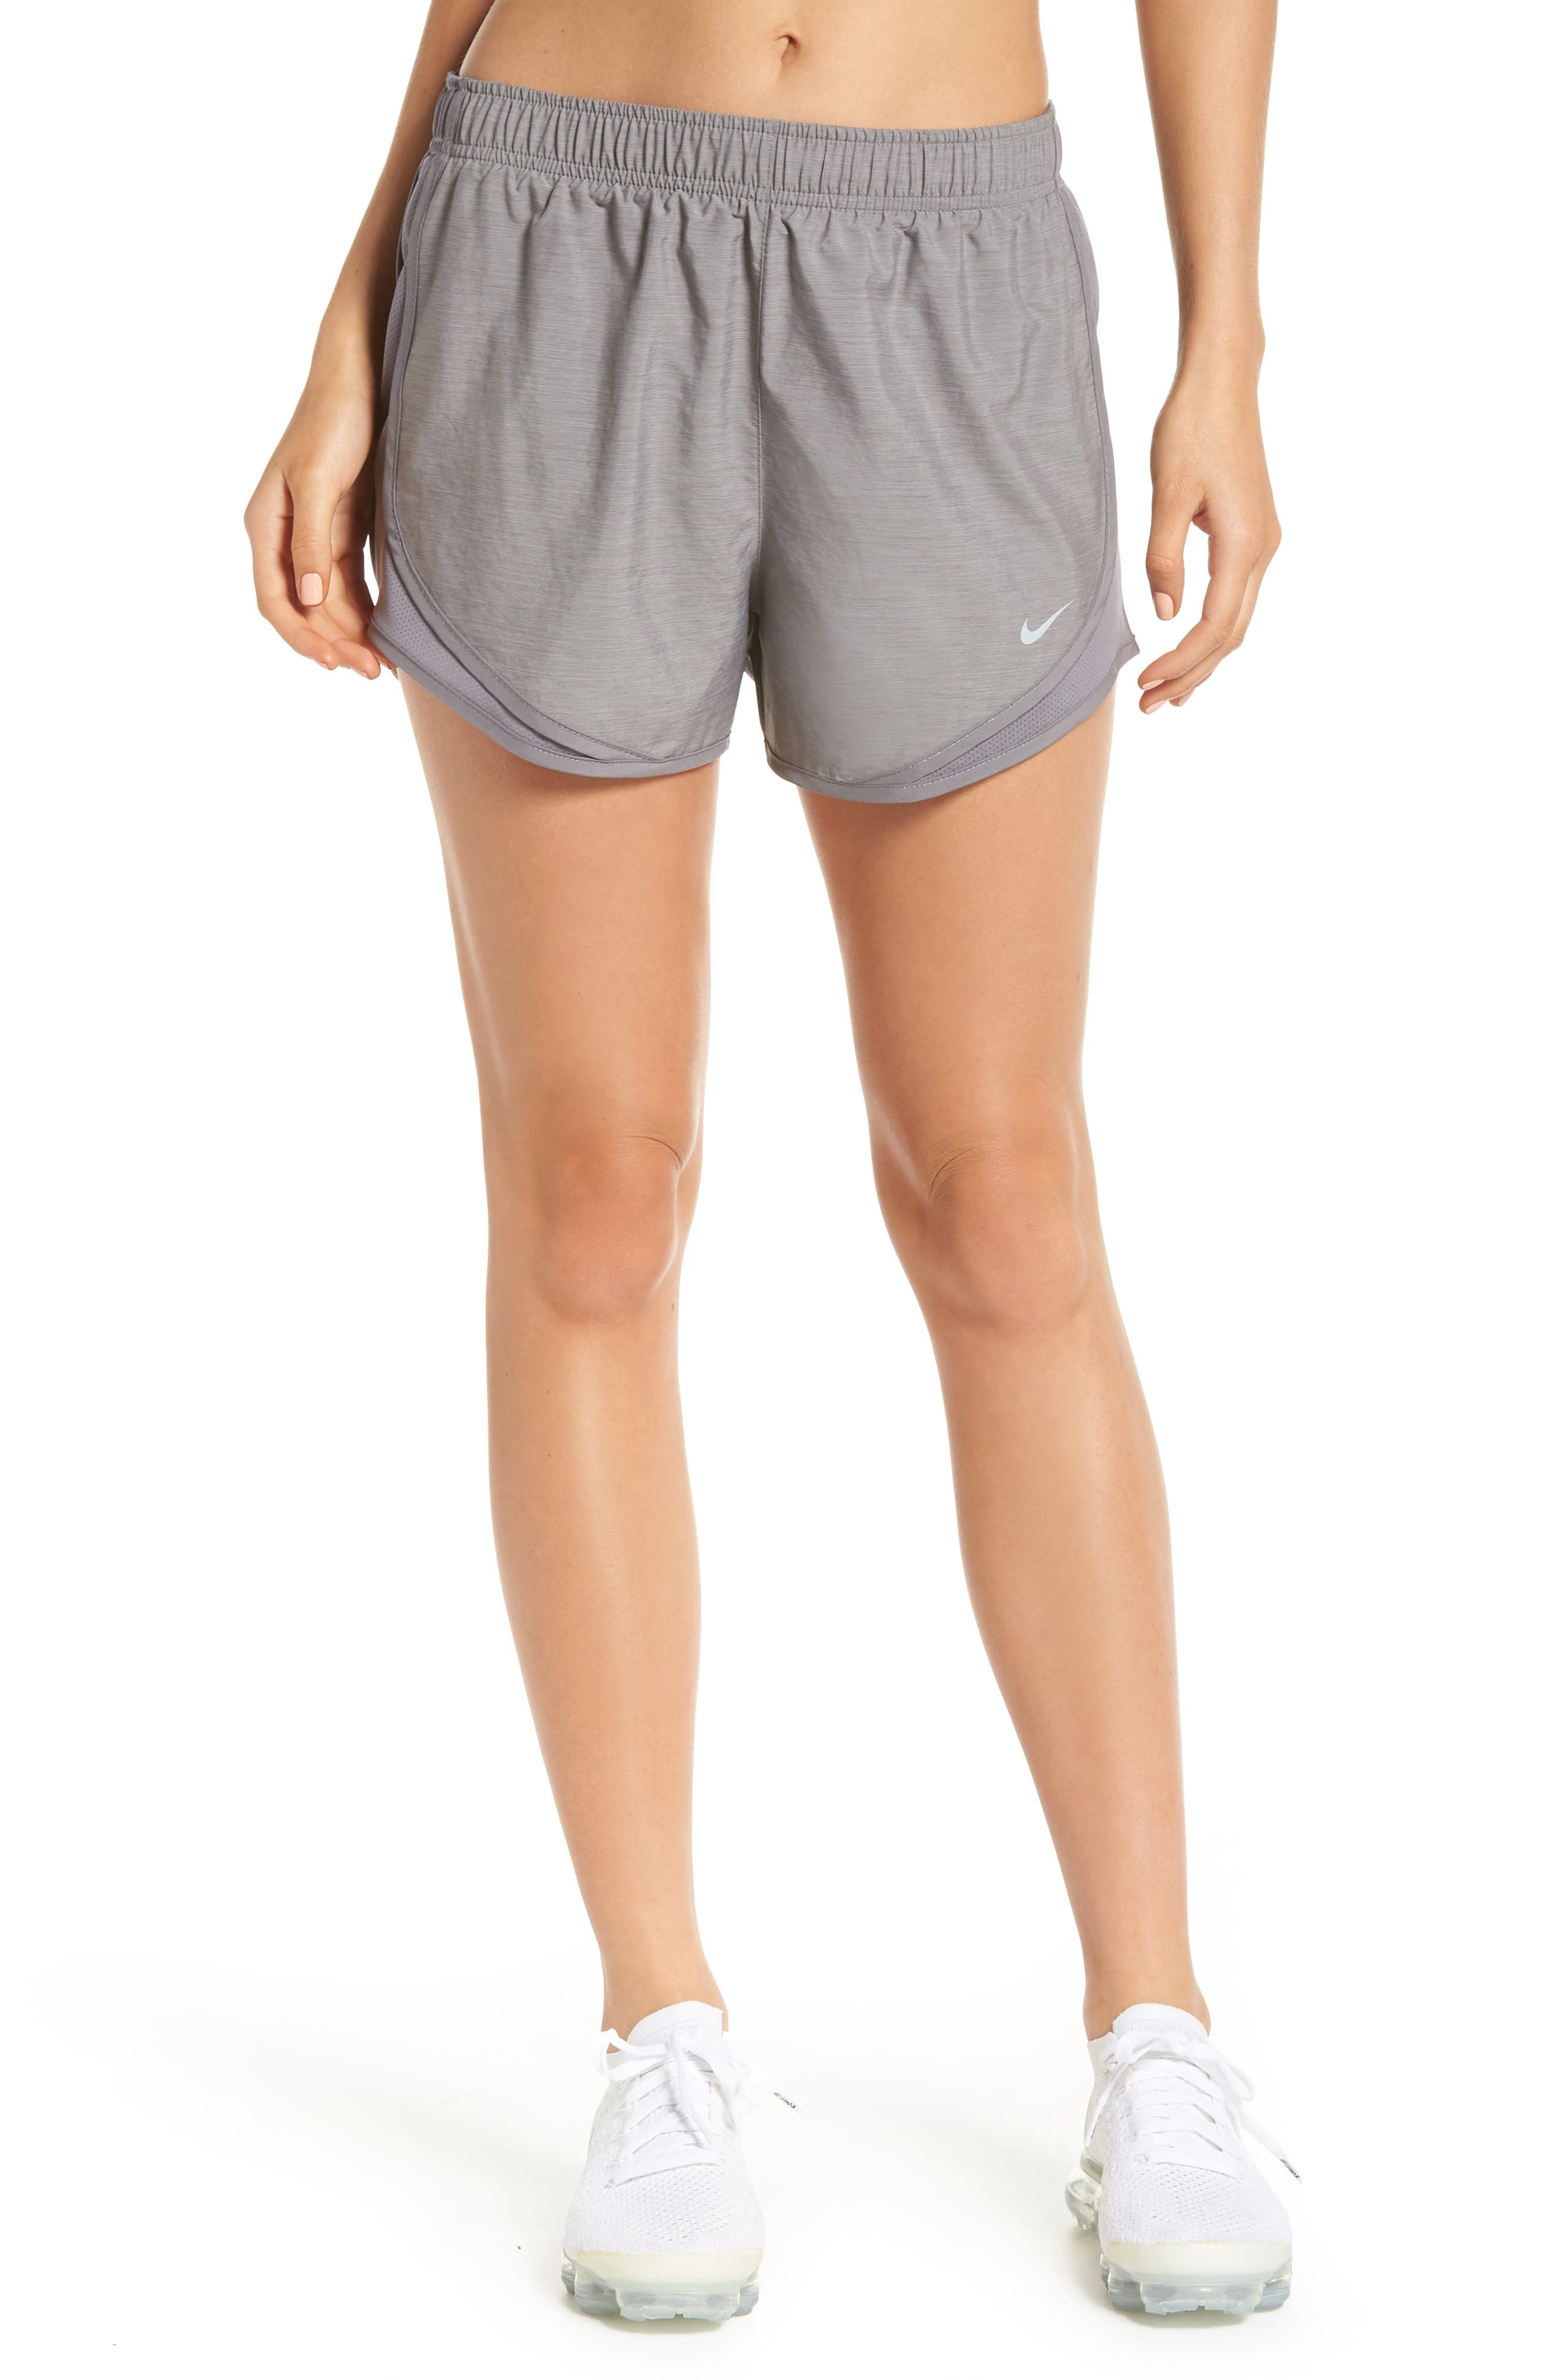 Dry Tempo Running Shorts,                         Main,                         color, Gunsmoke/ Wolf Grey